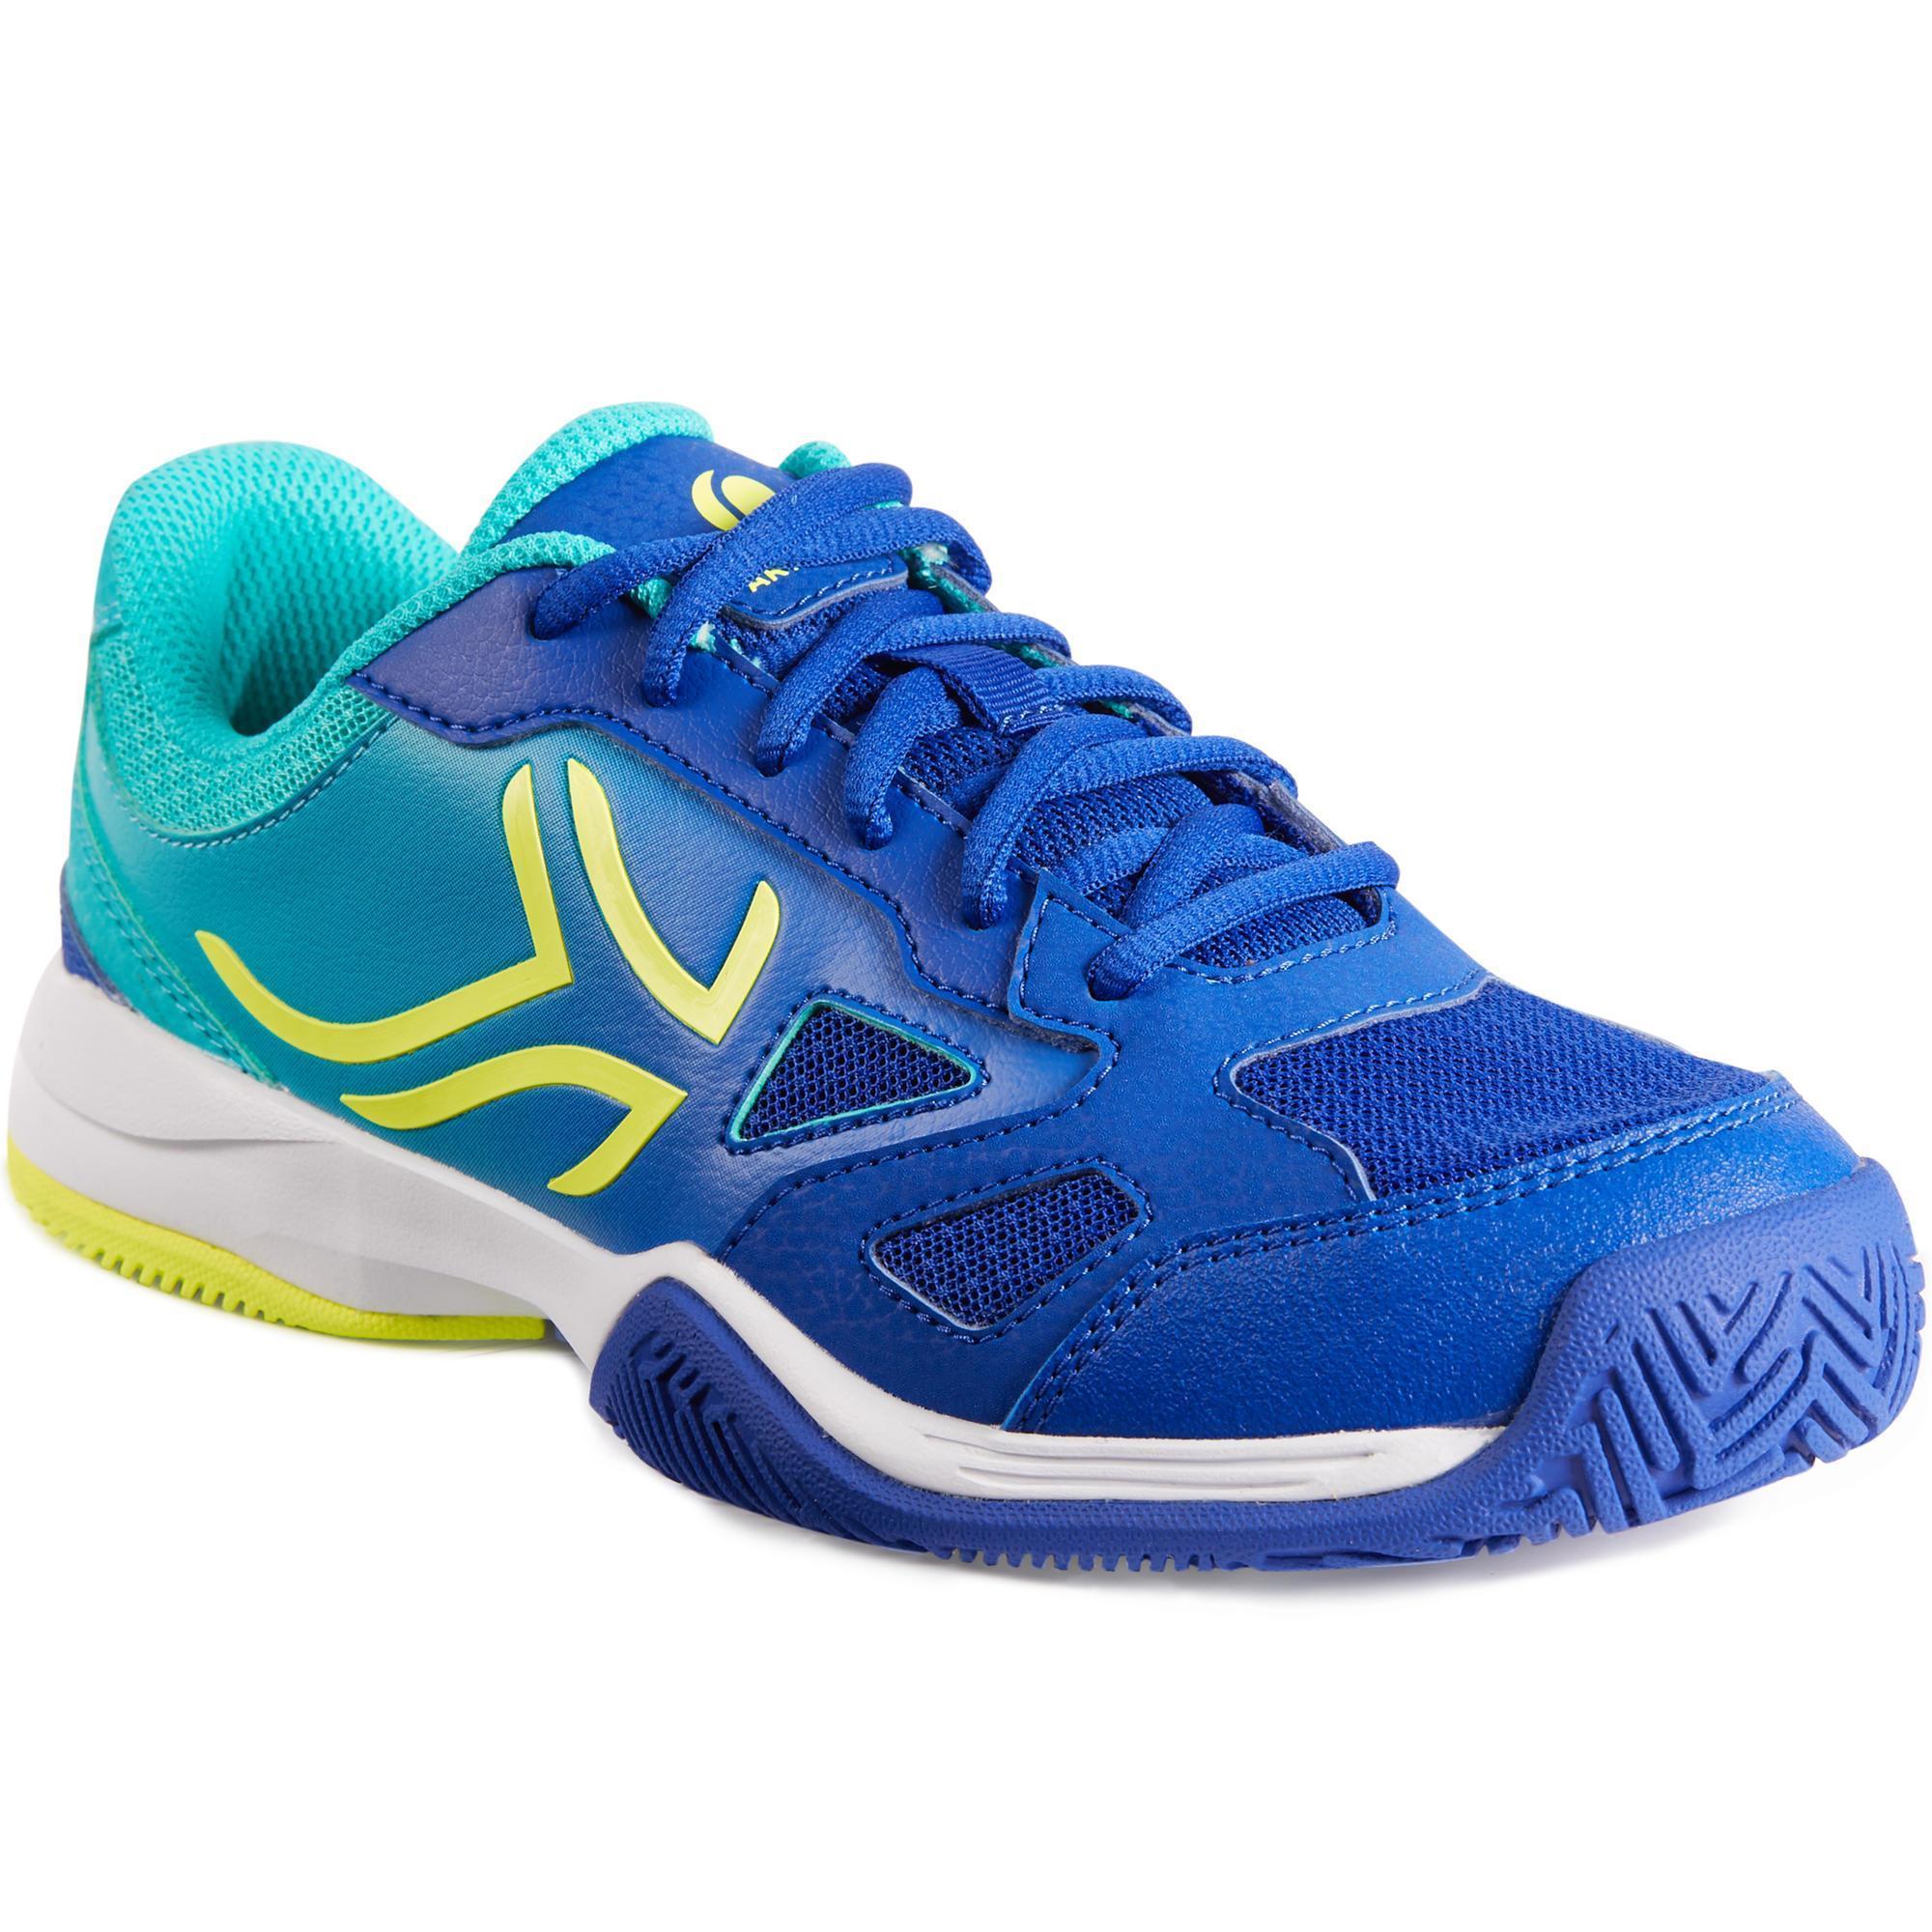 Artengo Tennisschoenen jongeren Artengo TS560